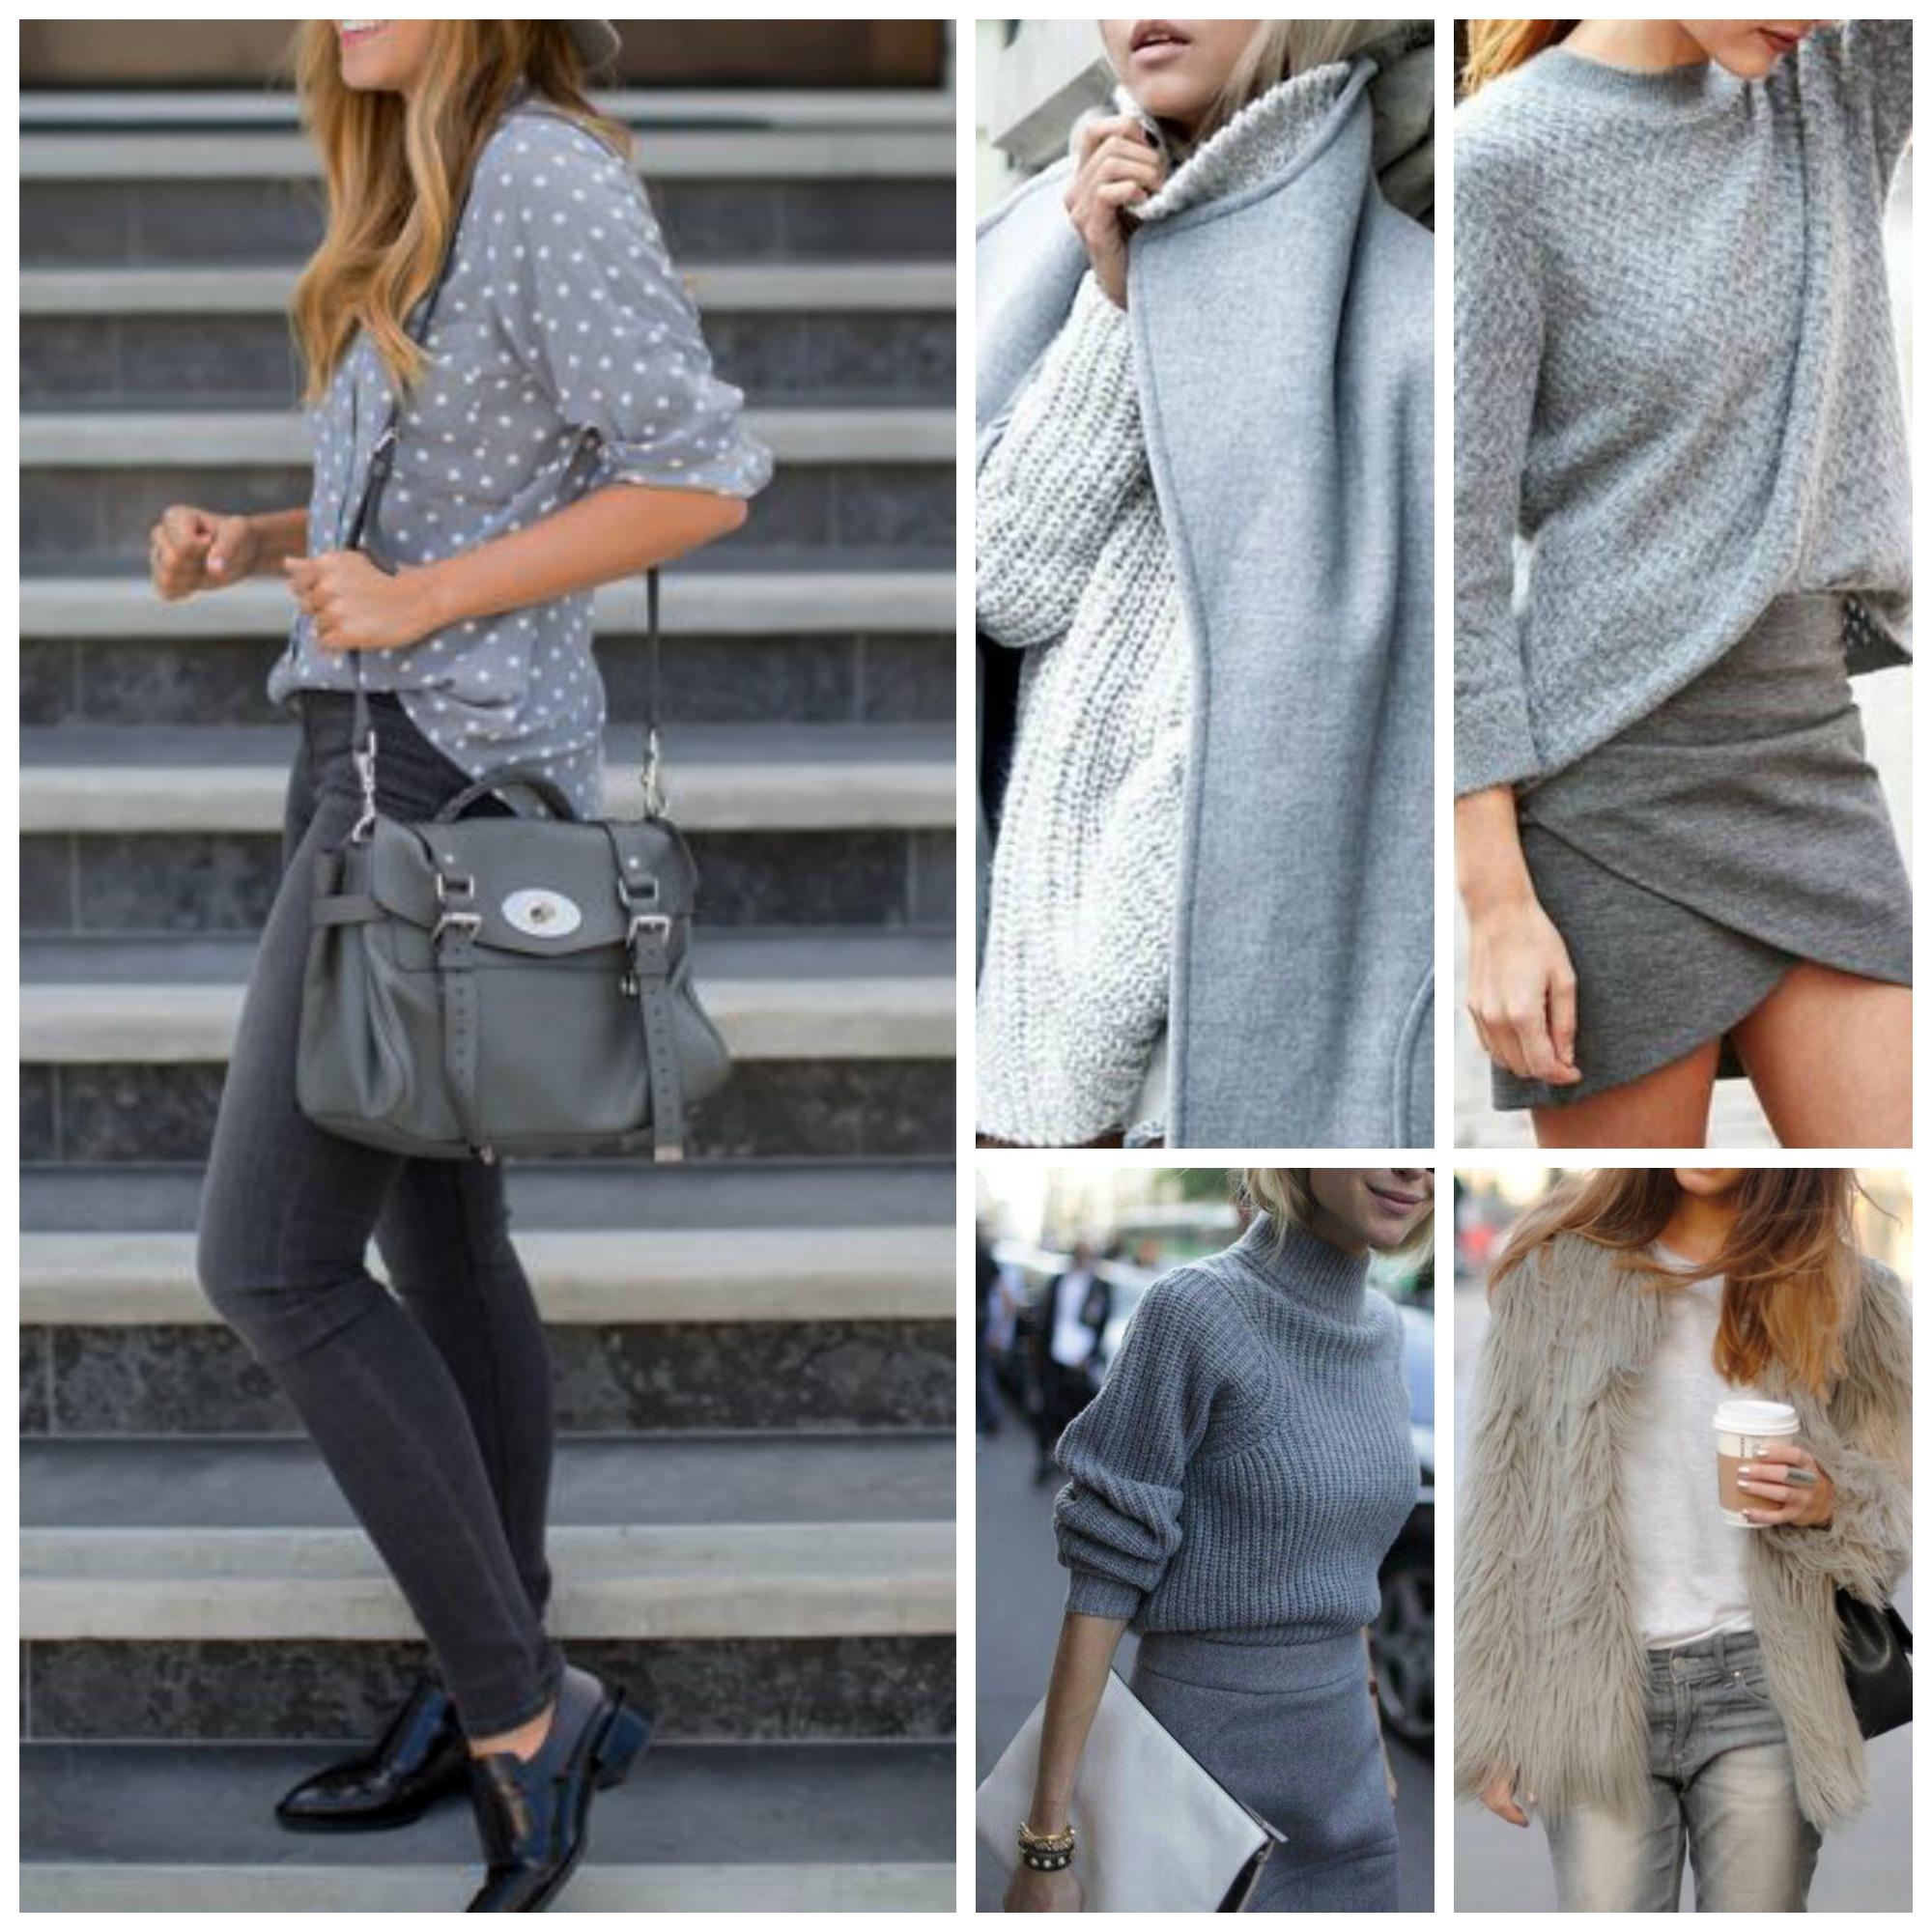 22c73d94e colores-de-moda-otoño-invierno-2014-2015-gris